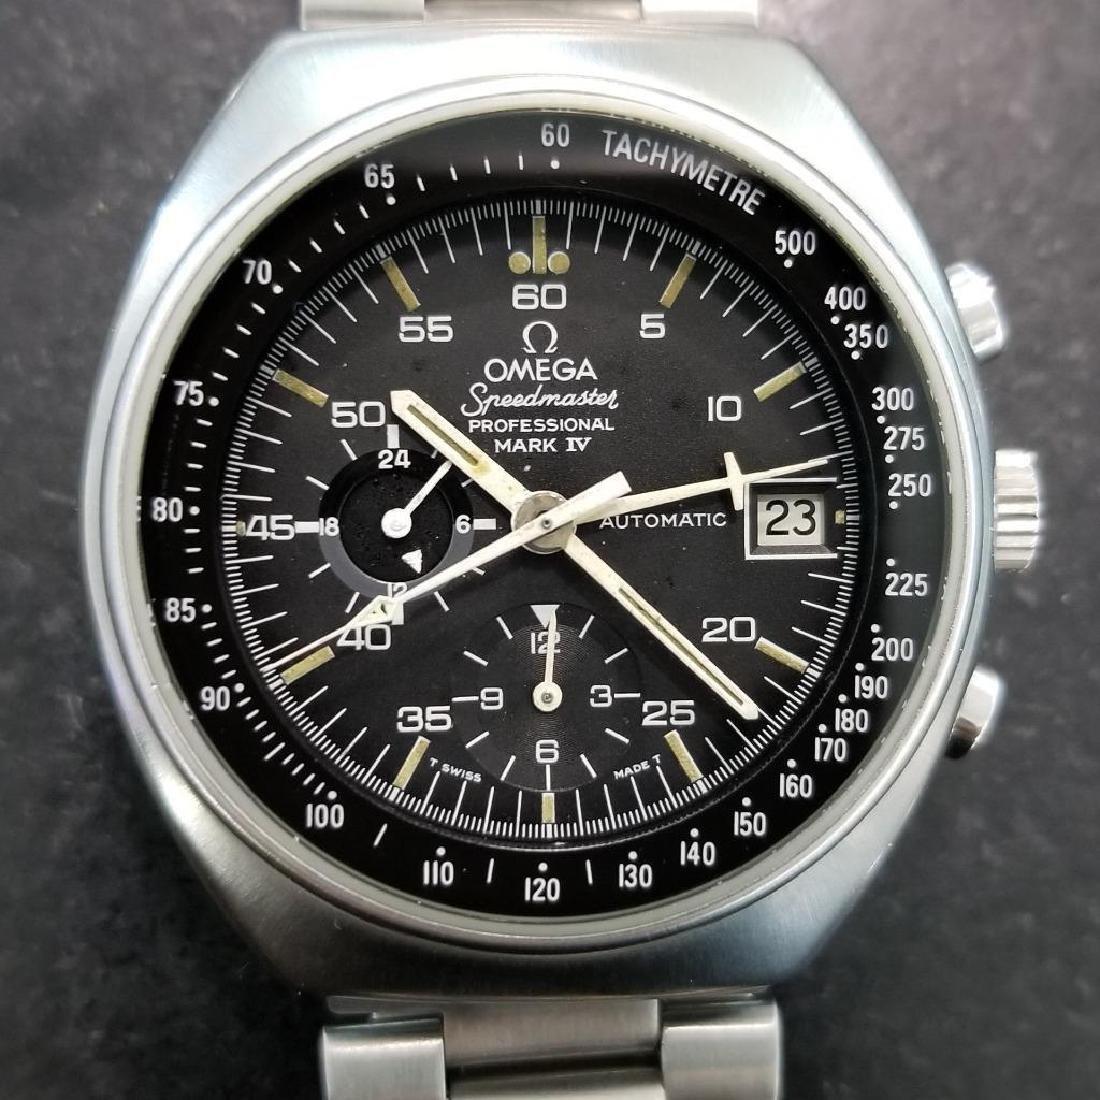 Omega Speedmaster Mark IV 1970s Professional